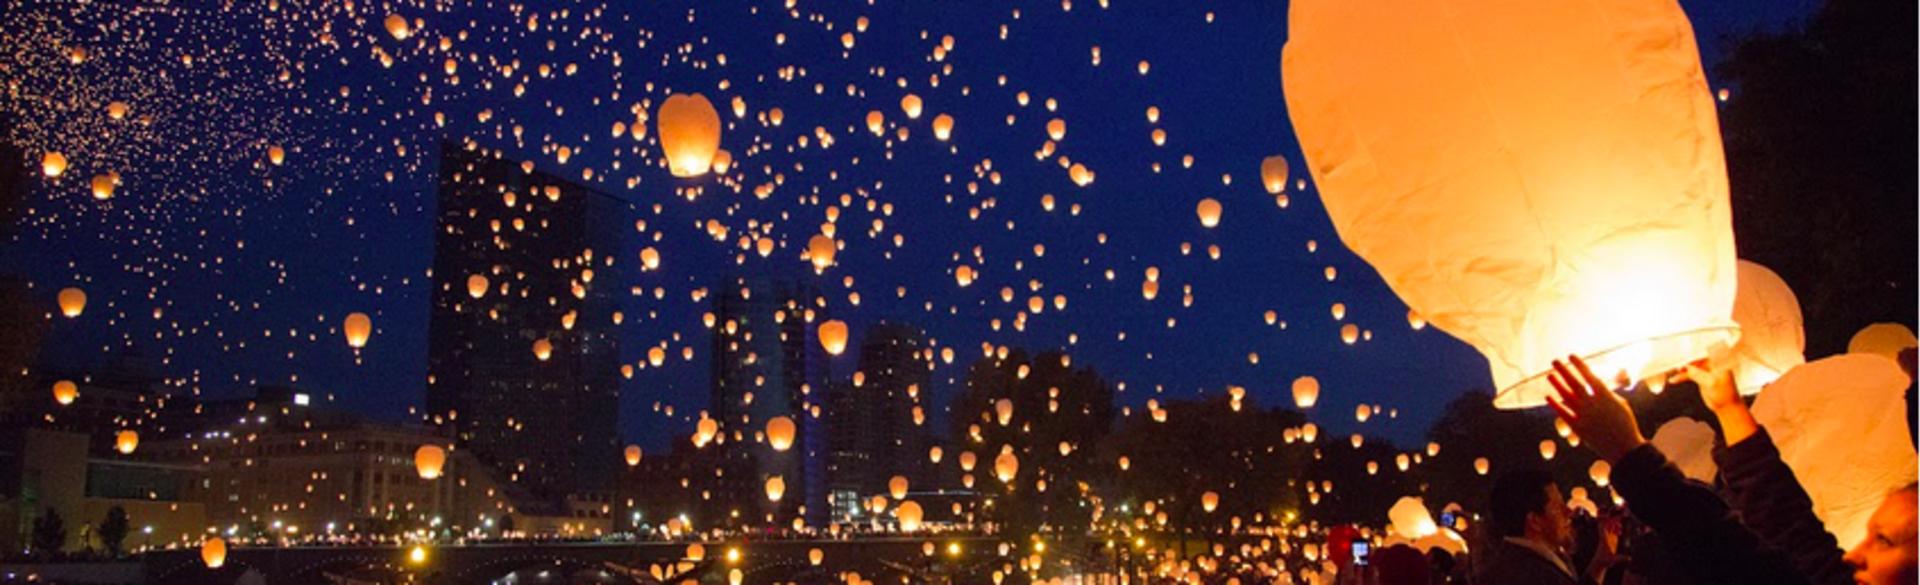 Floating Lanterns ArtPrize 2012